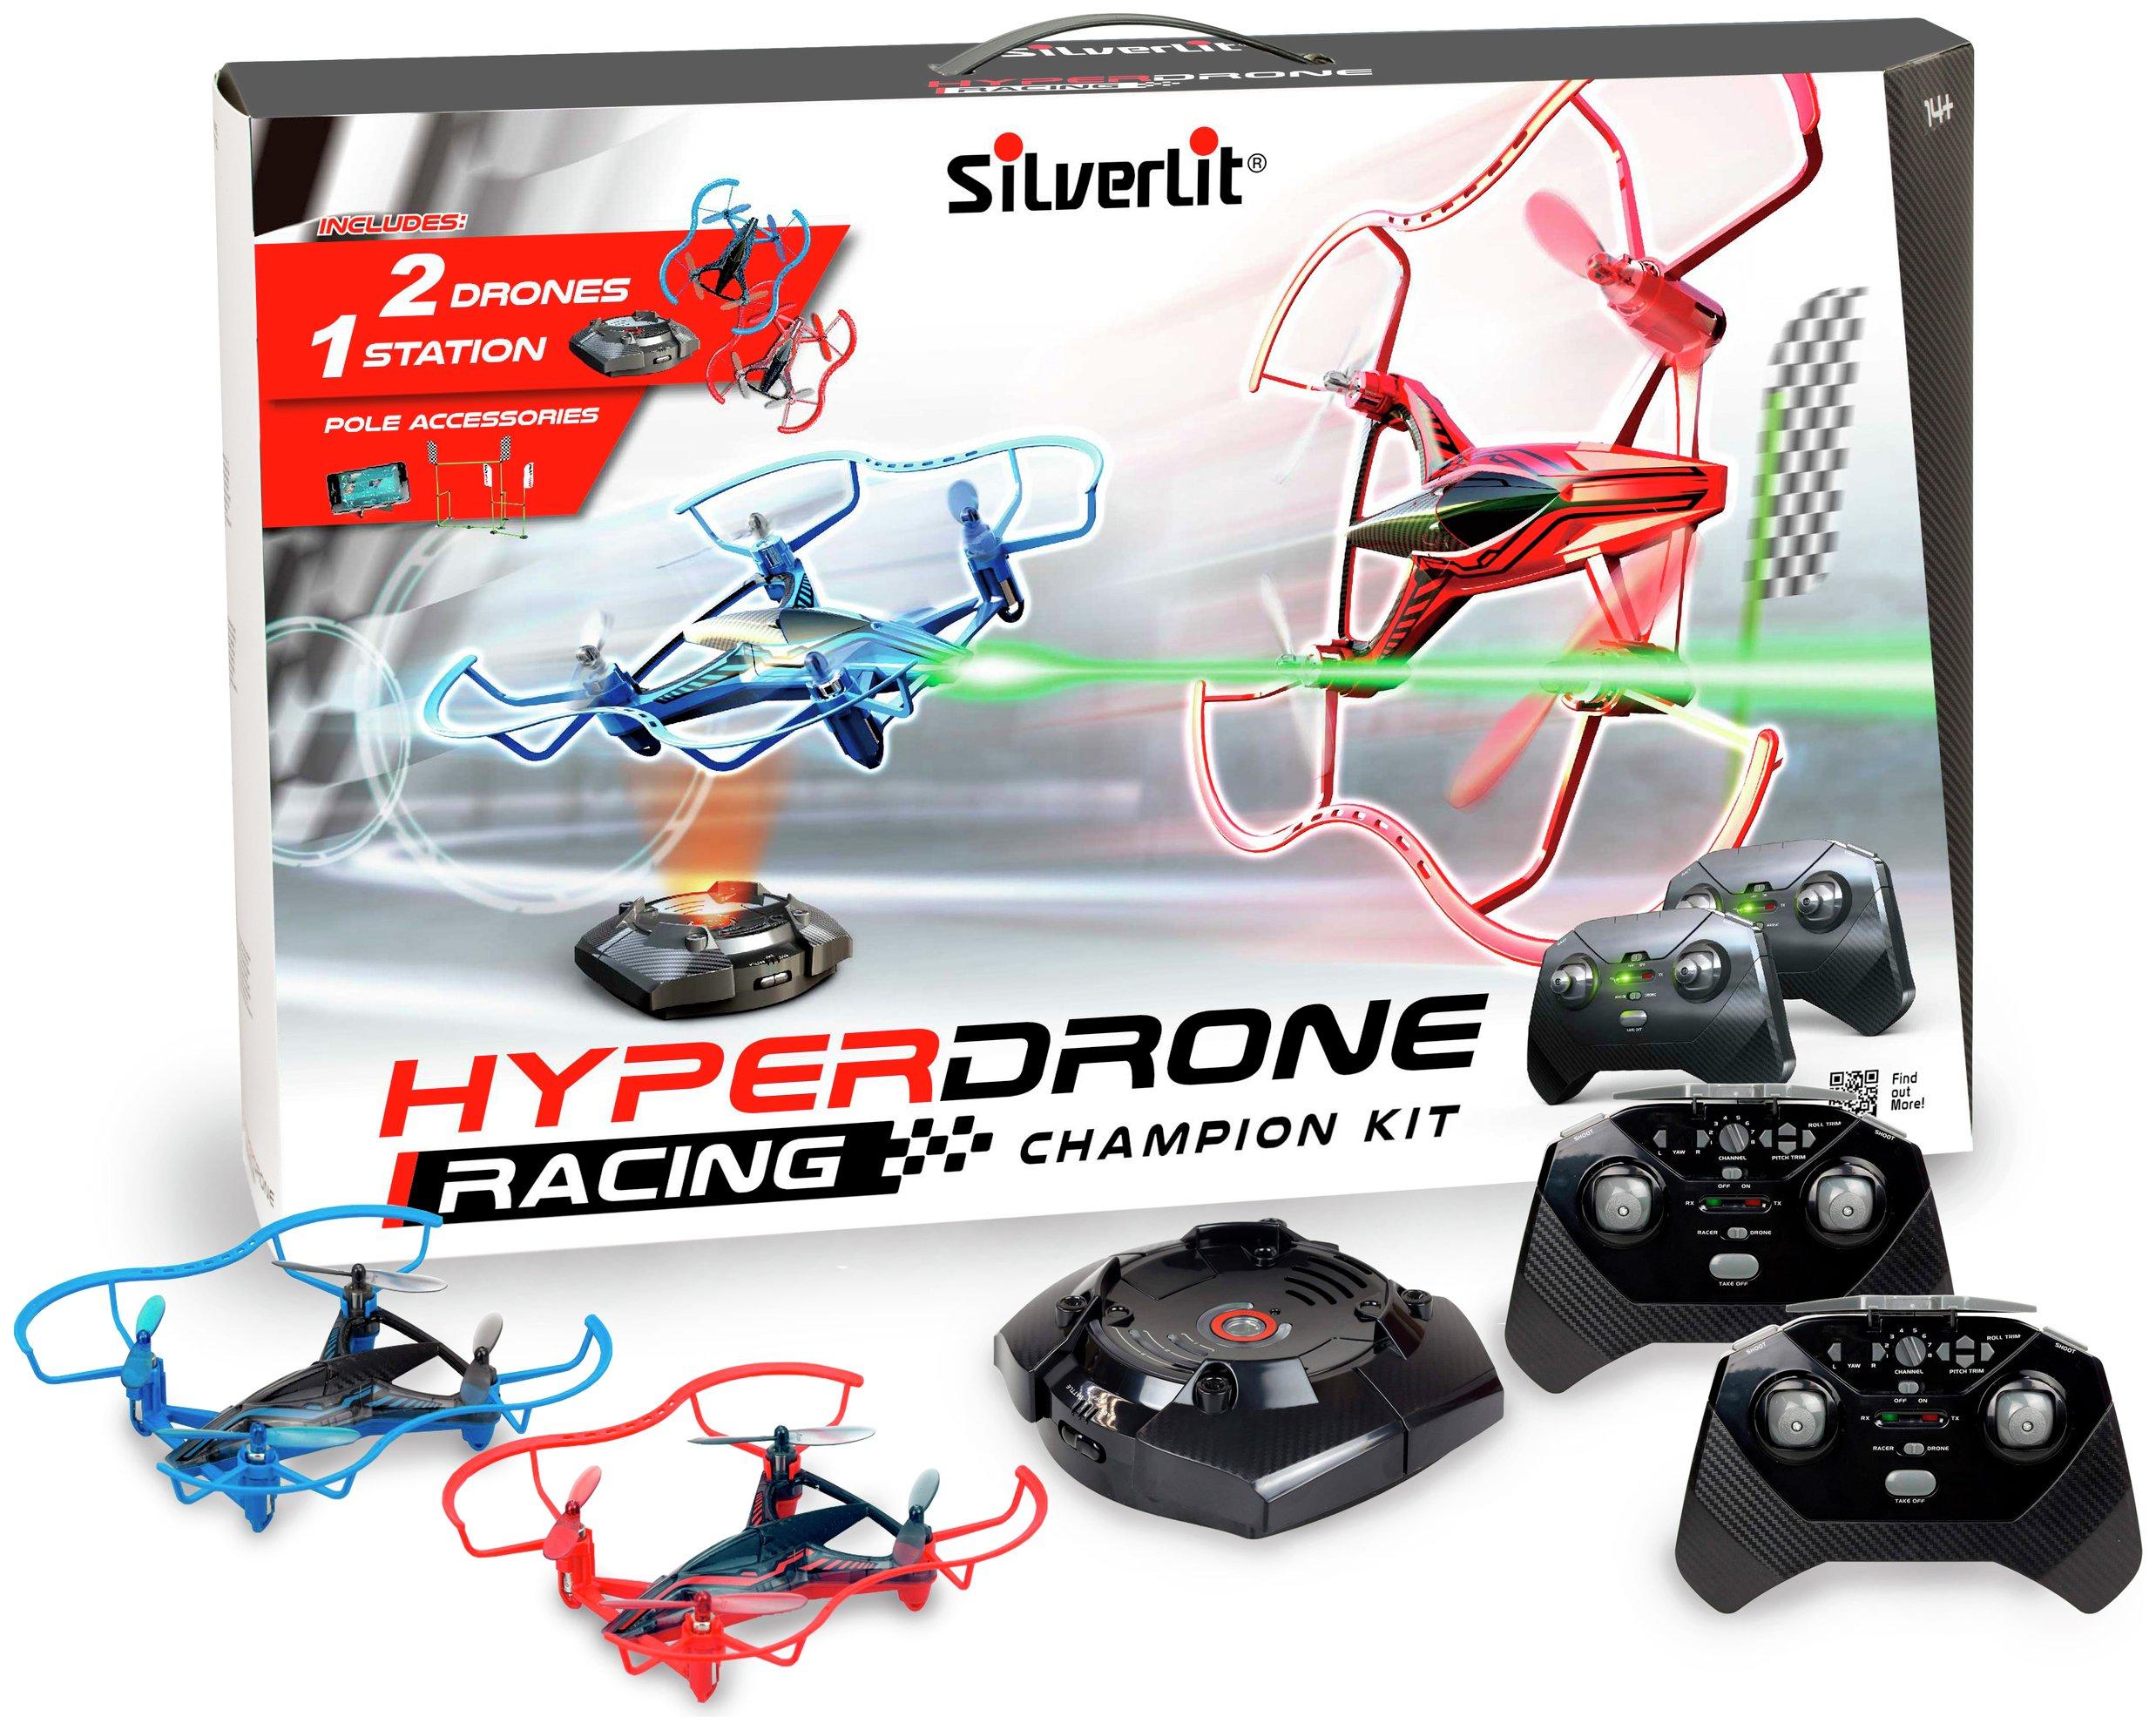 Silverlit 2.4G Hyperdrone Racing Kit.